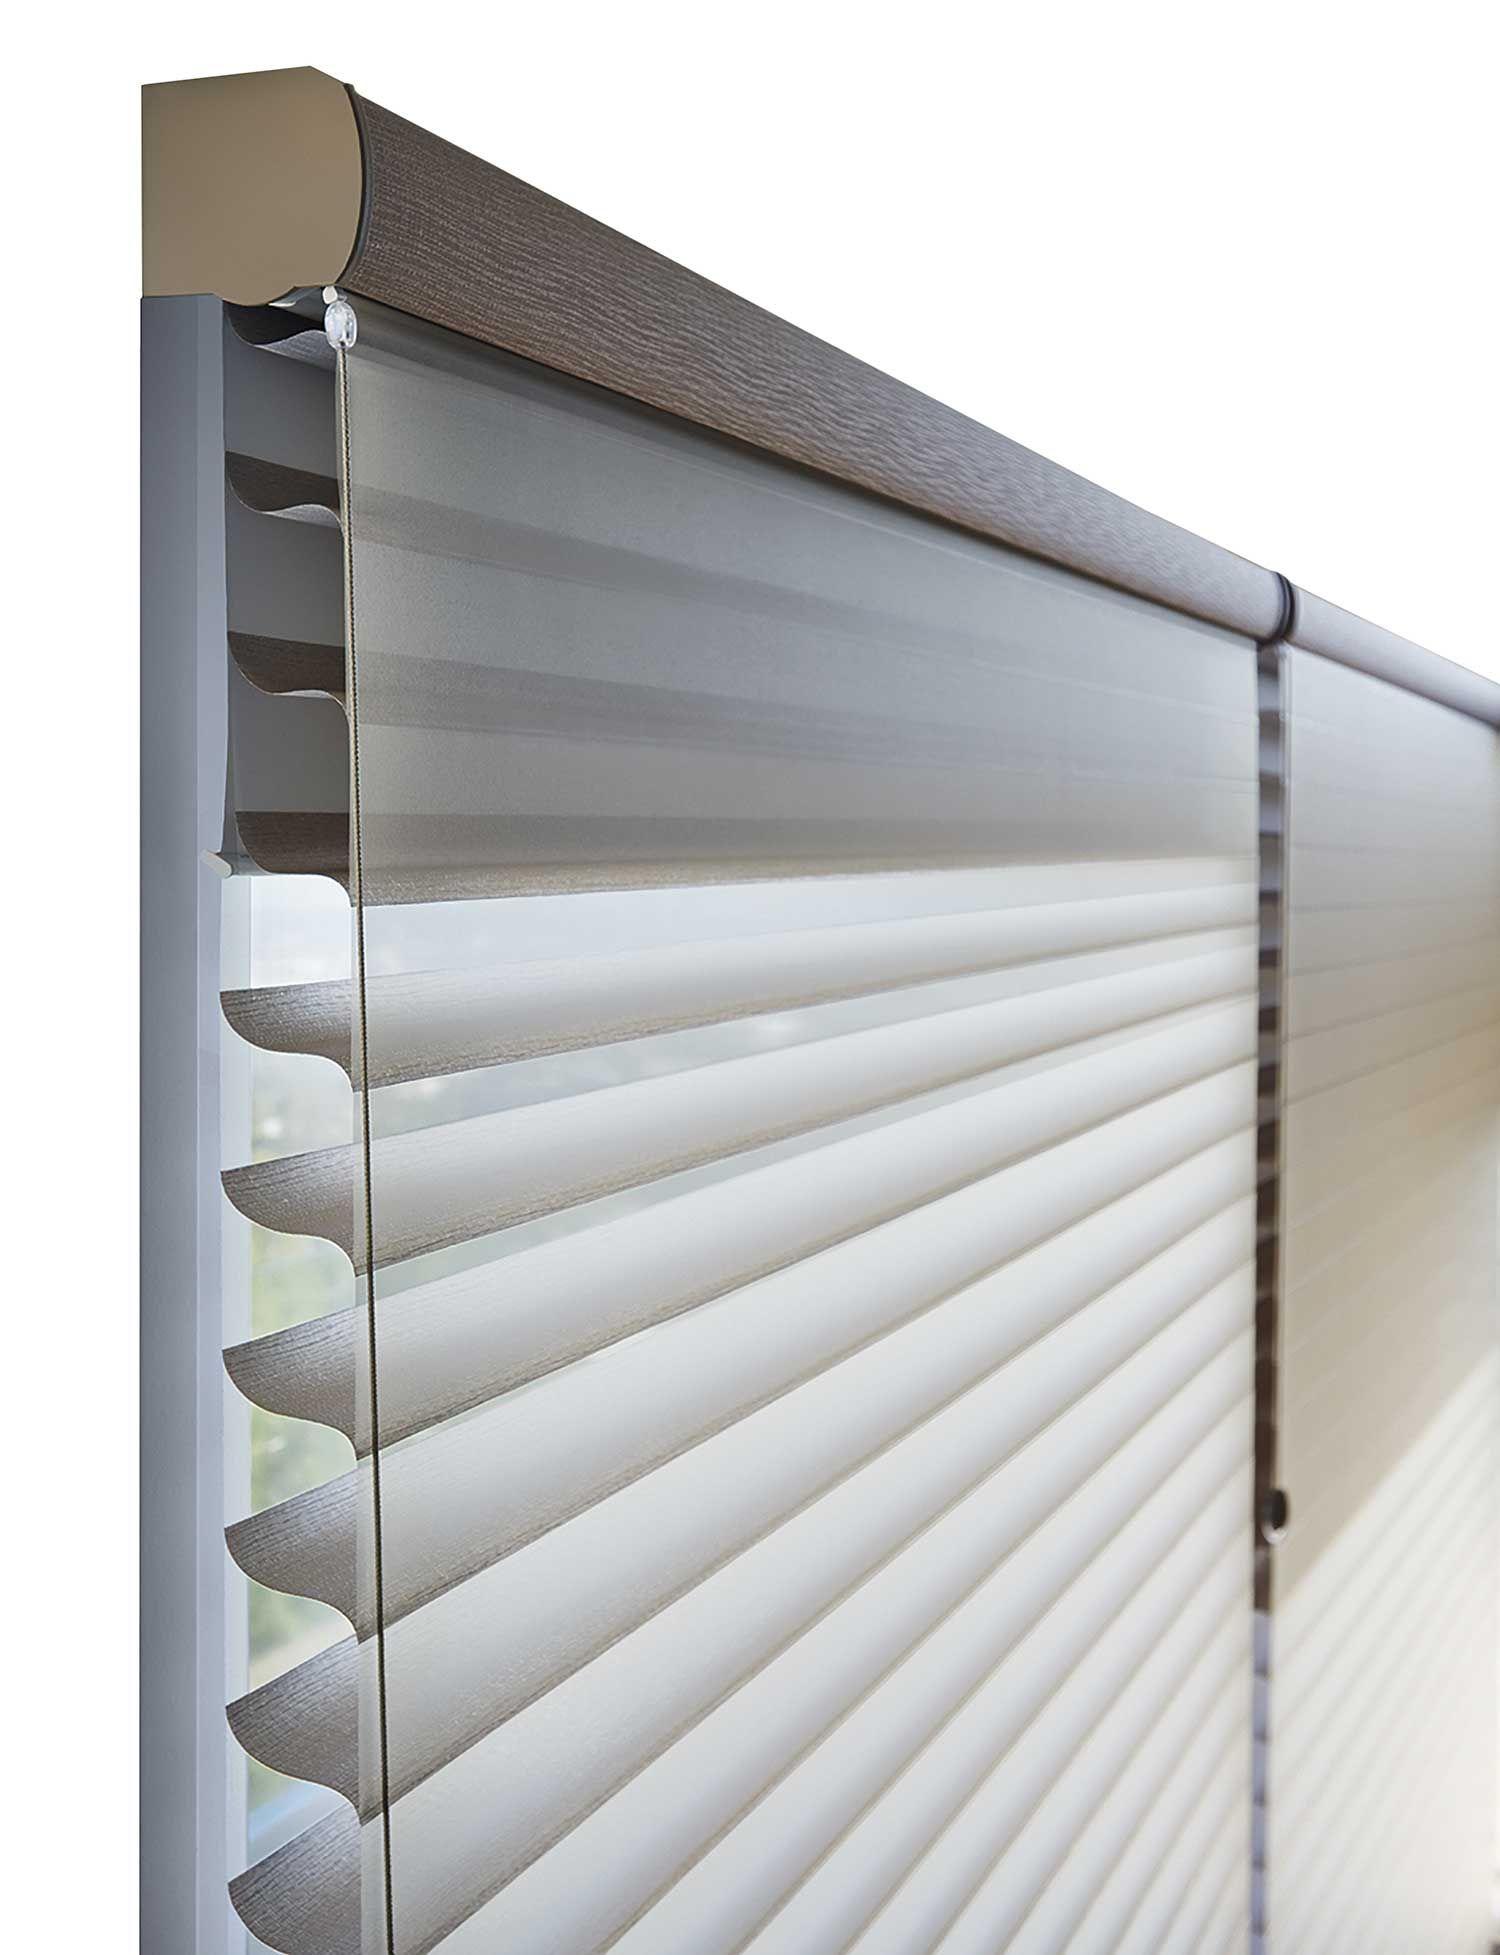 Silhouette Duolite With A Room Darkening Roller Shade Behind It Window Curtain Designs Curtains Room Darkening Roller Shade